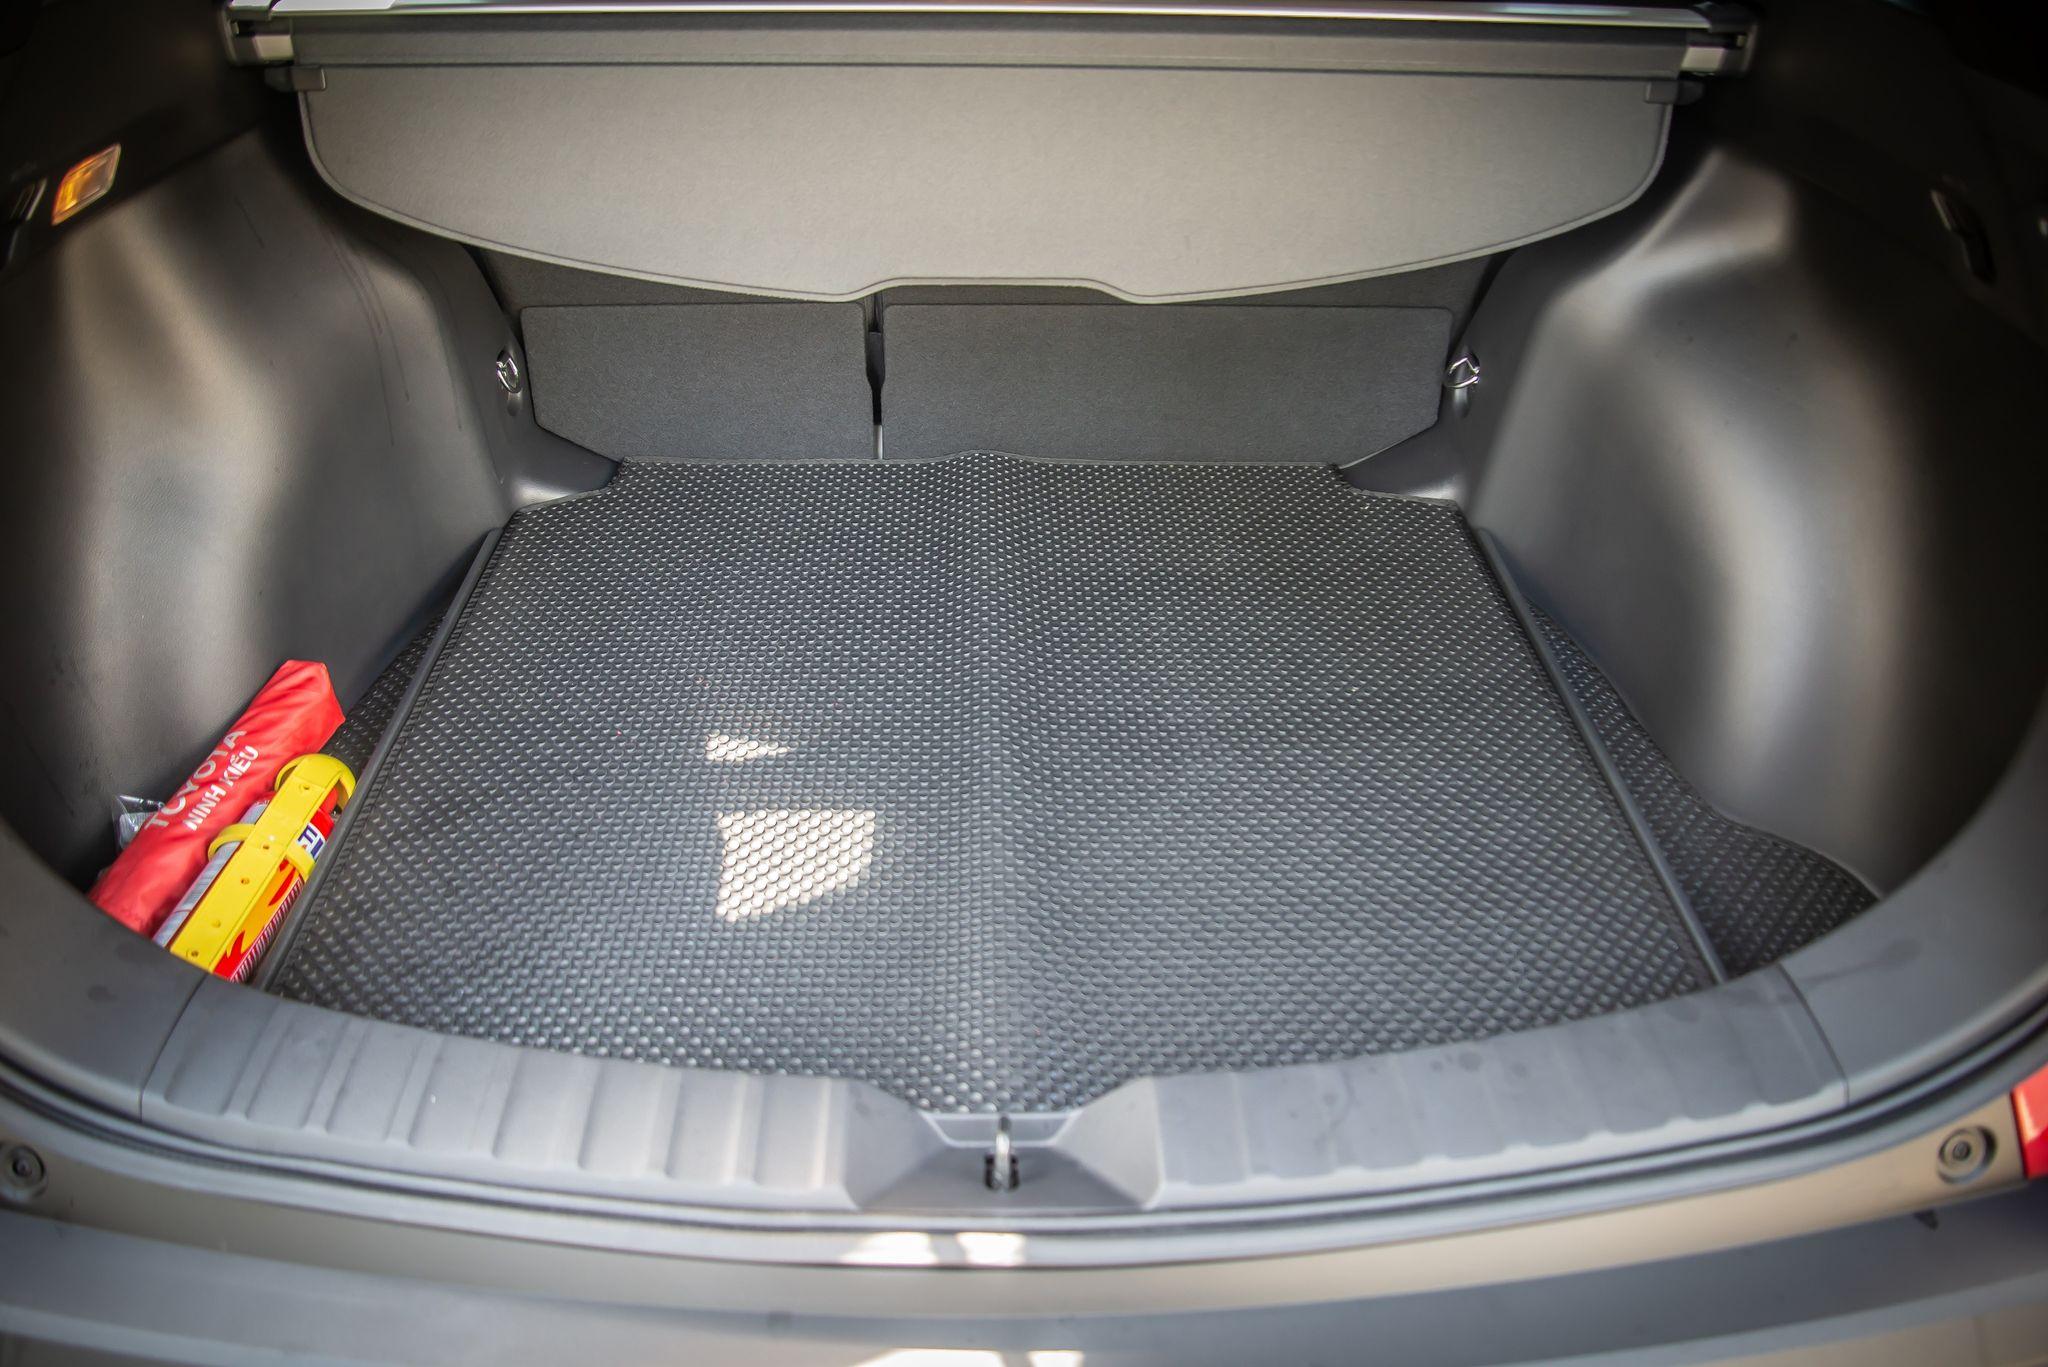 Thảm lót cốp Toyota Corolla Cross 2020